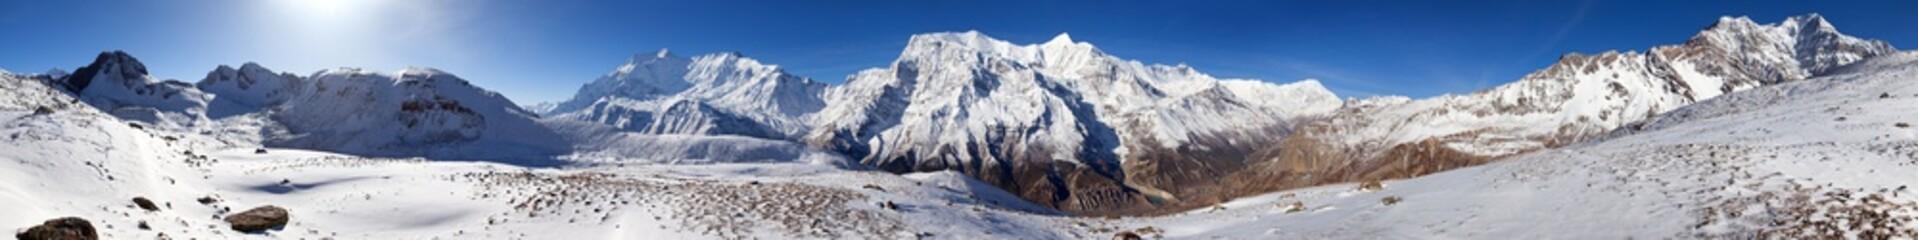 Panoramic view of Annapurna Himal